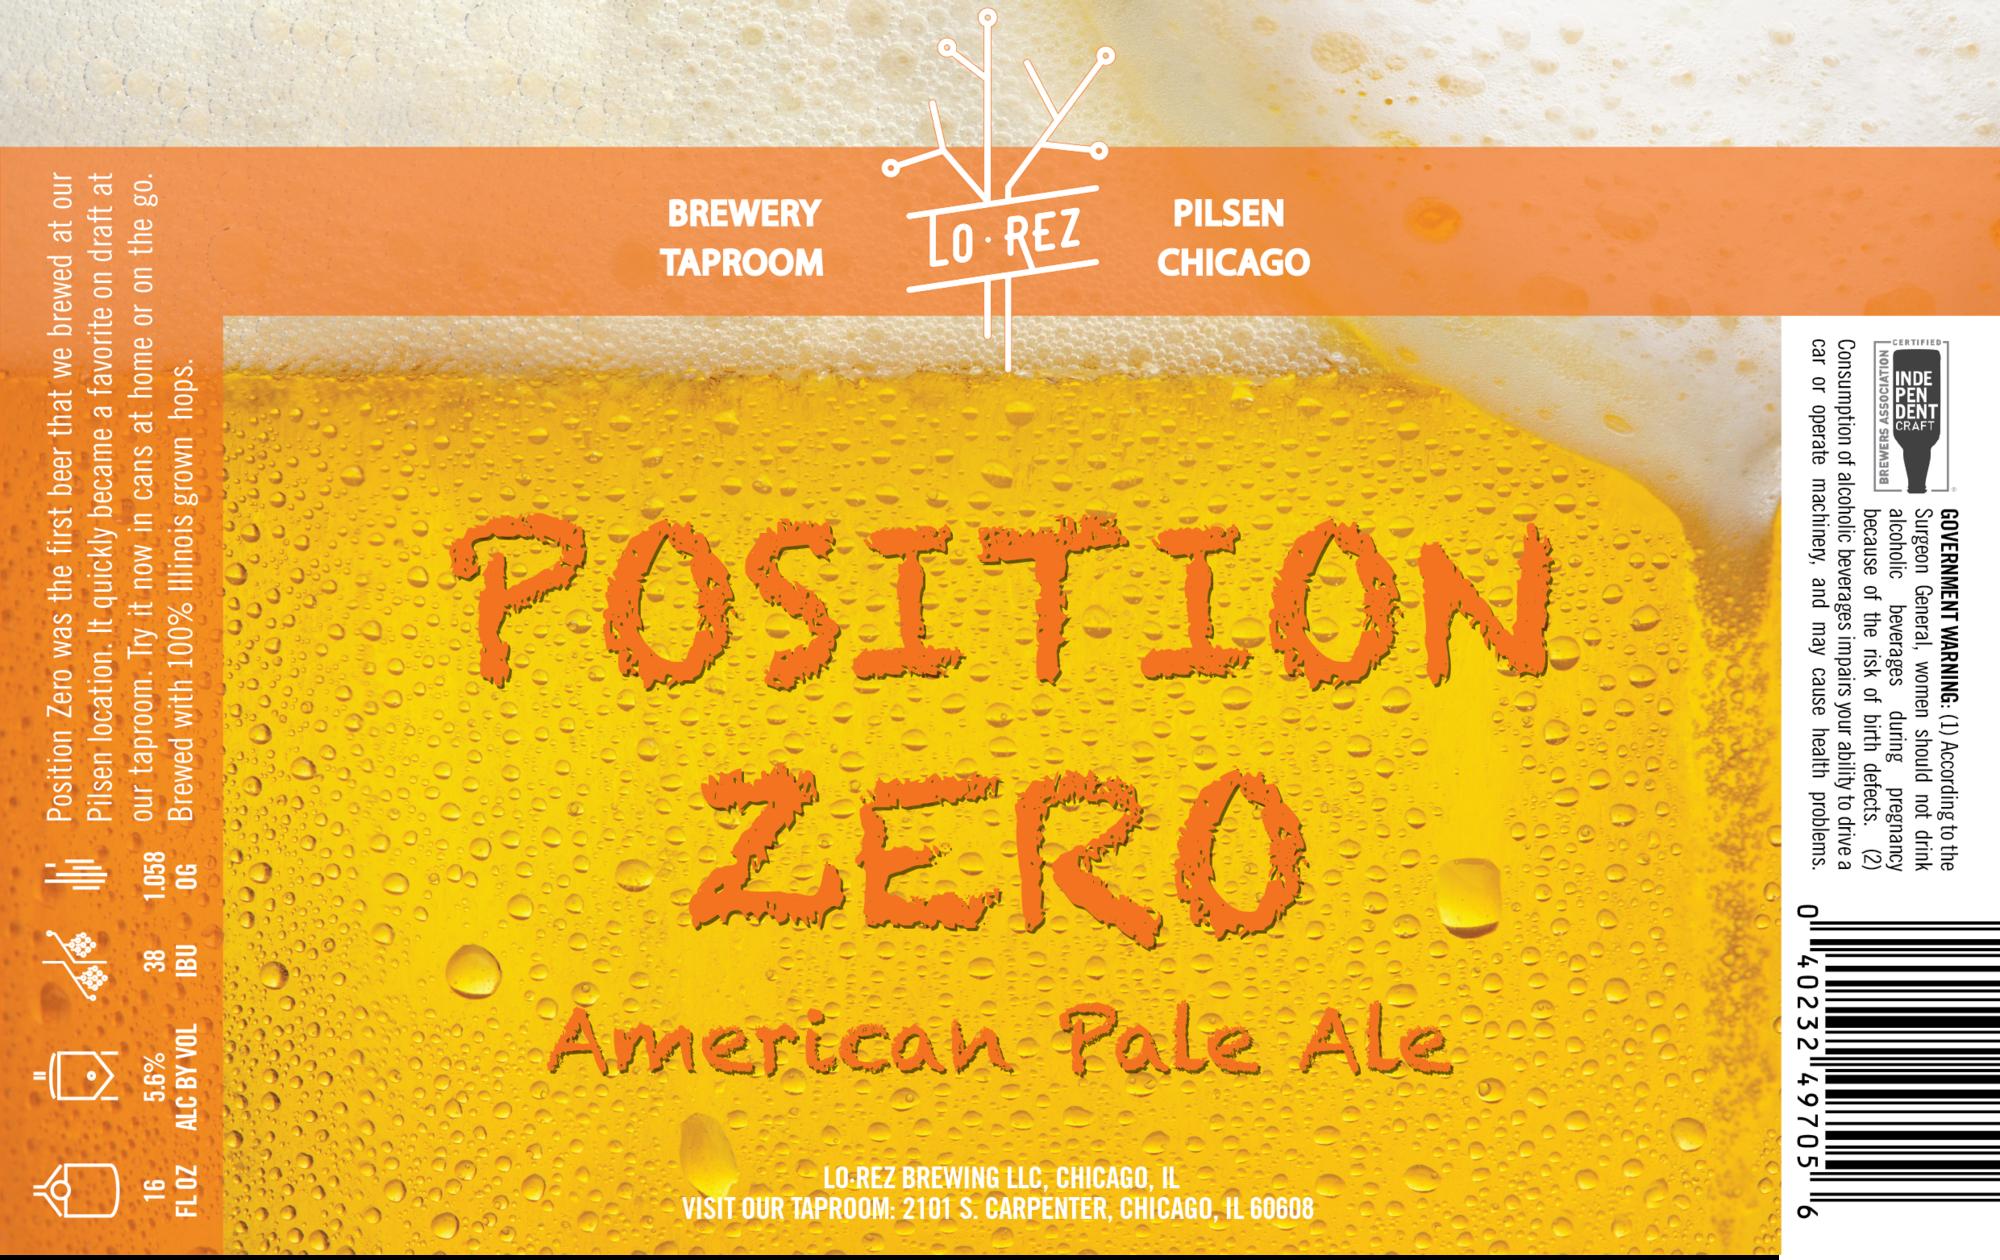 Lo Rez - Position Zero beer Label Full Size